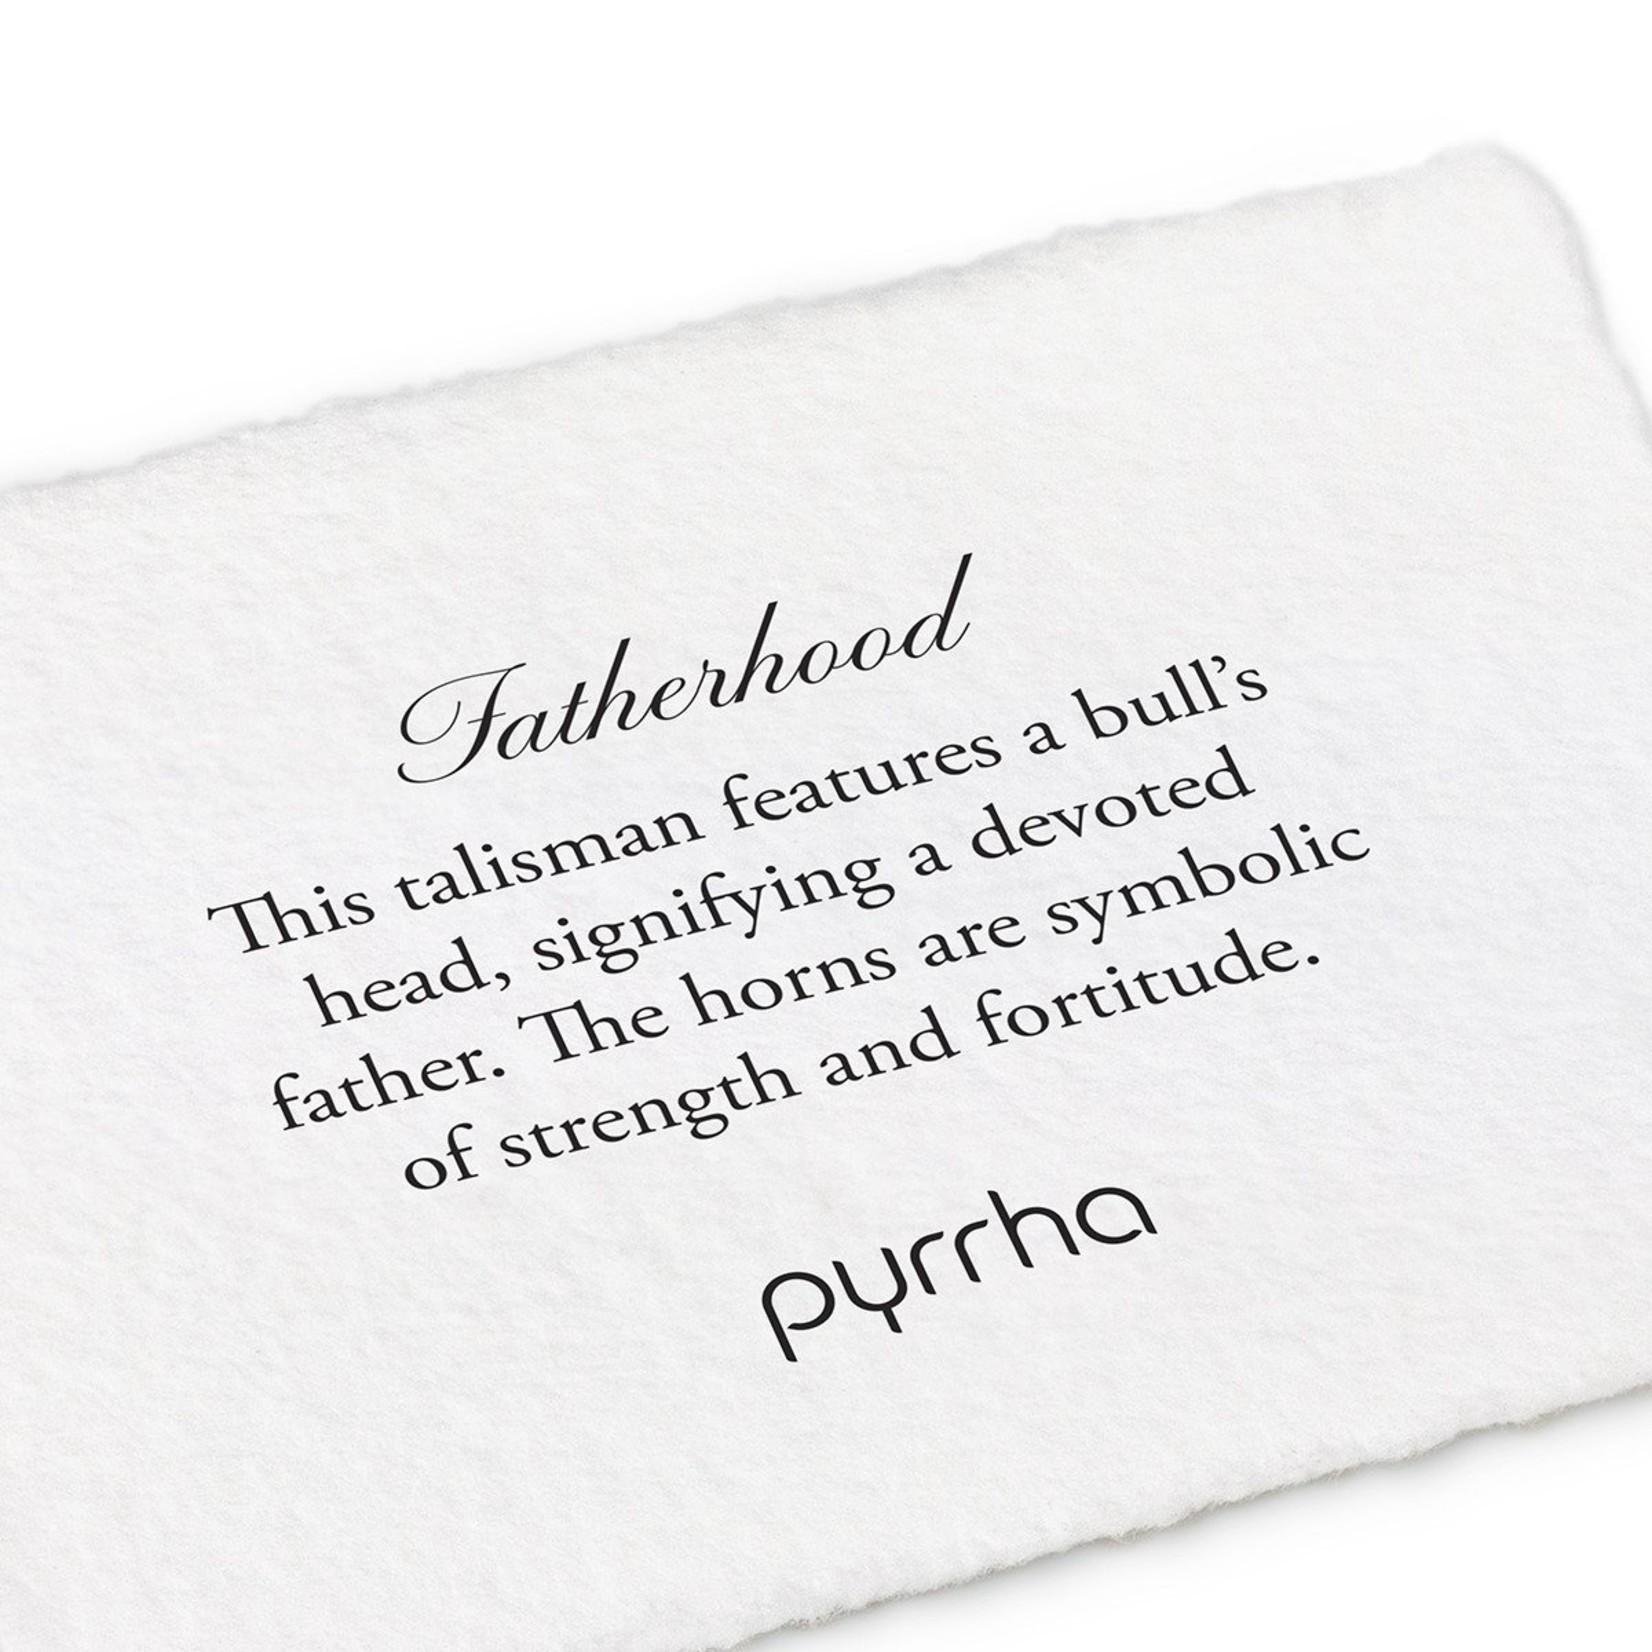 Pyrrha Fatherhood Signature Talisman